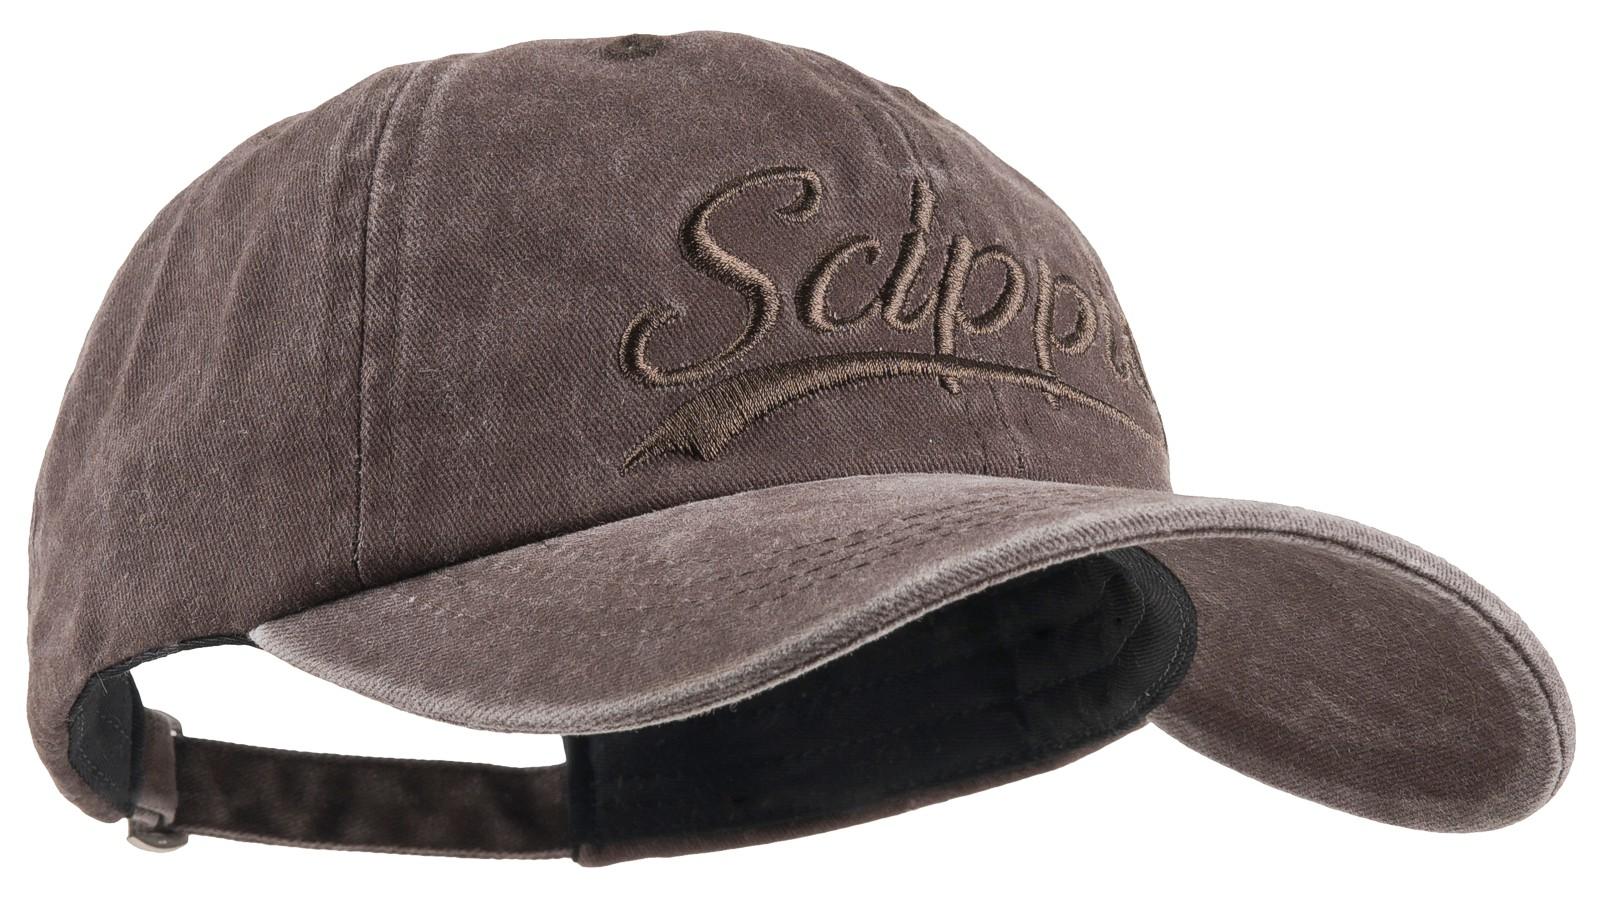 Scippis Baseball-Cap »Scippis Schriftzug« Braun